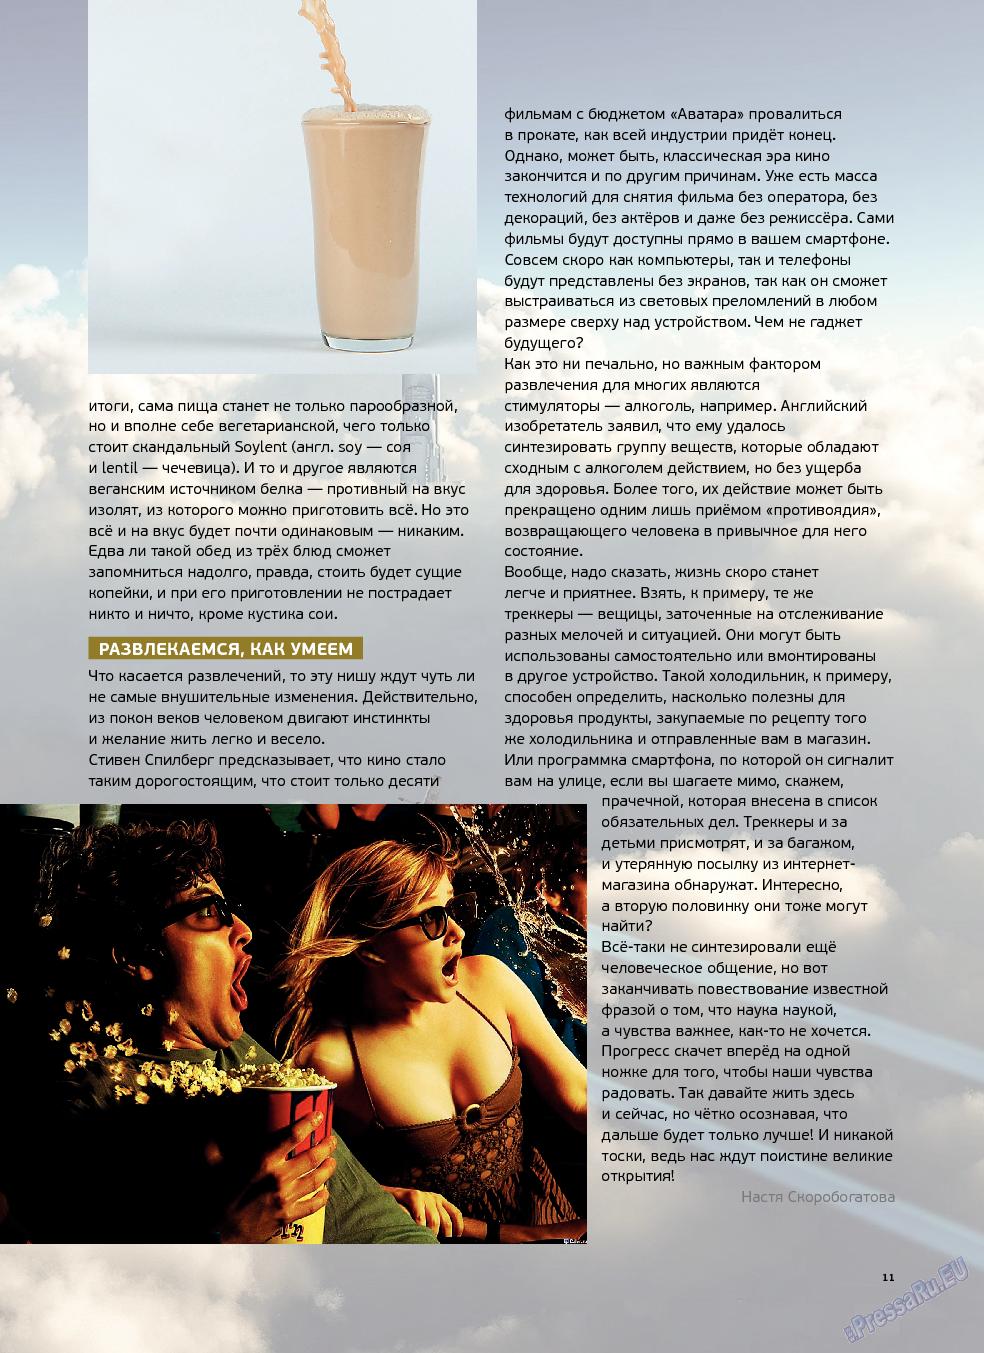 Артек (журнал). 2013 год, номер 5, стр. 13